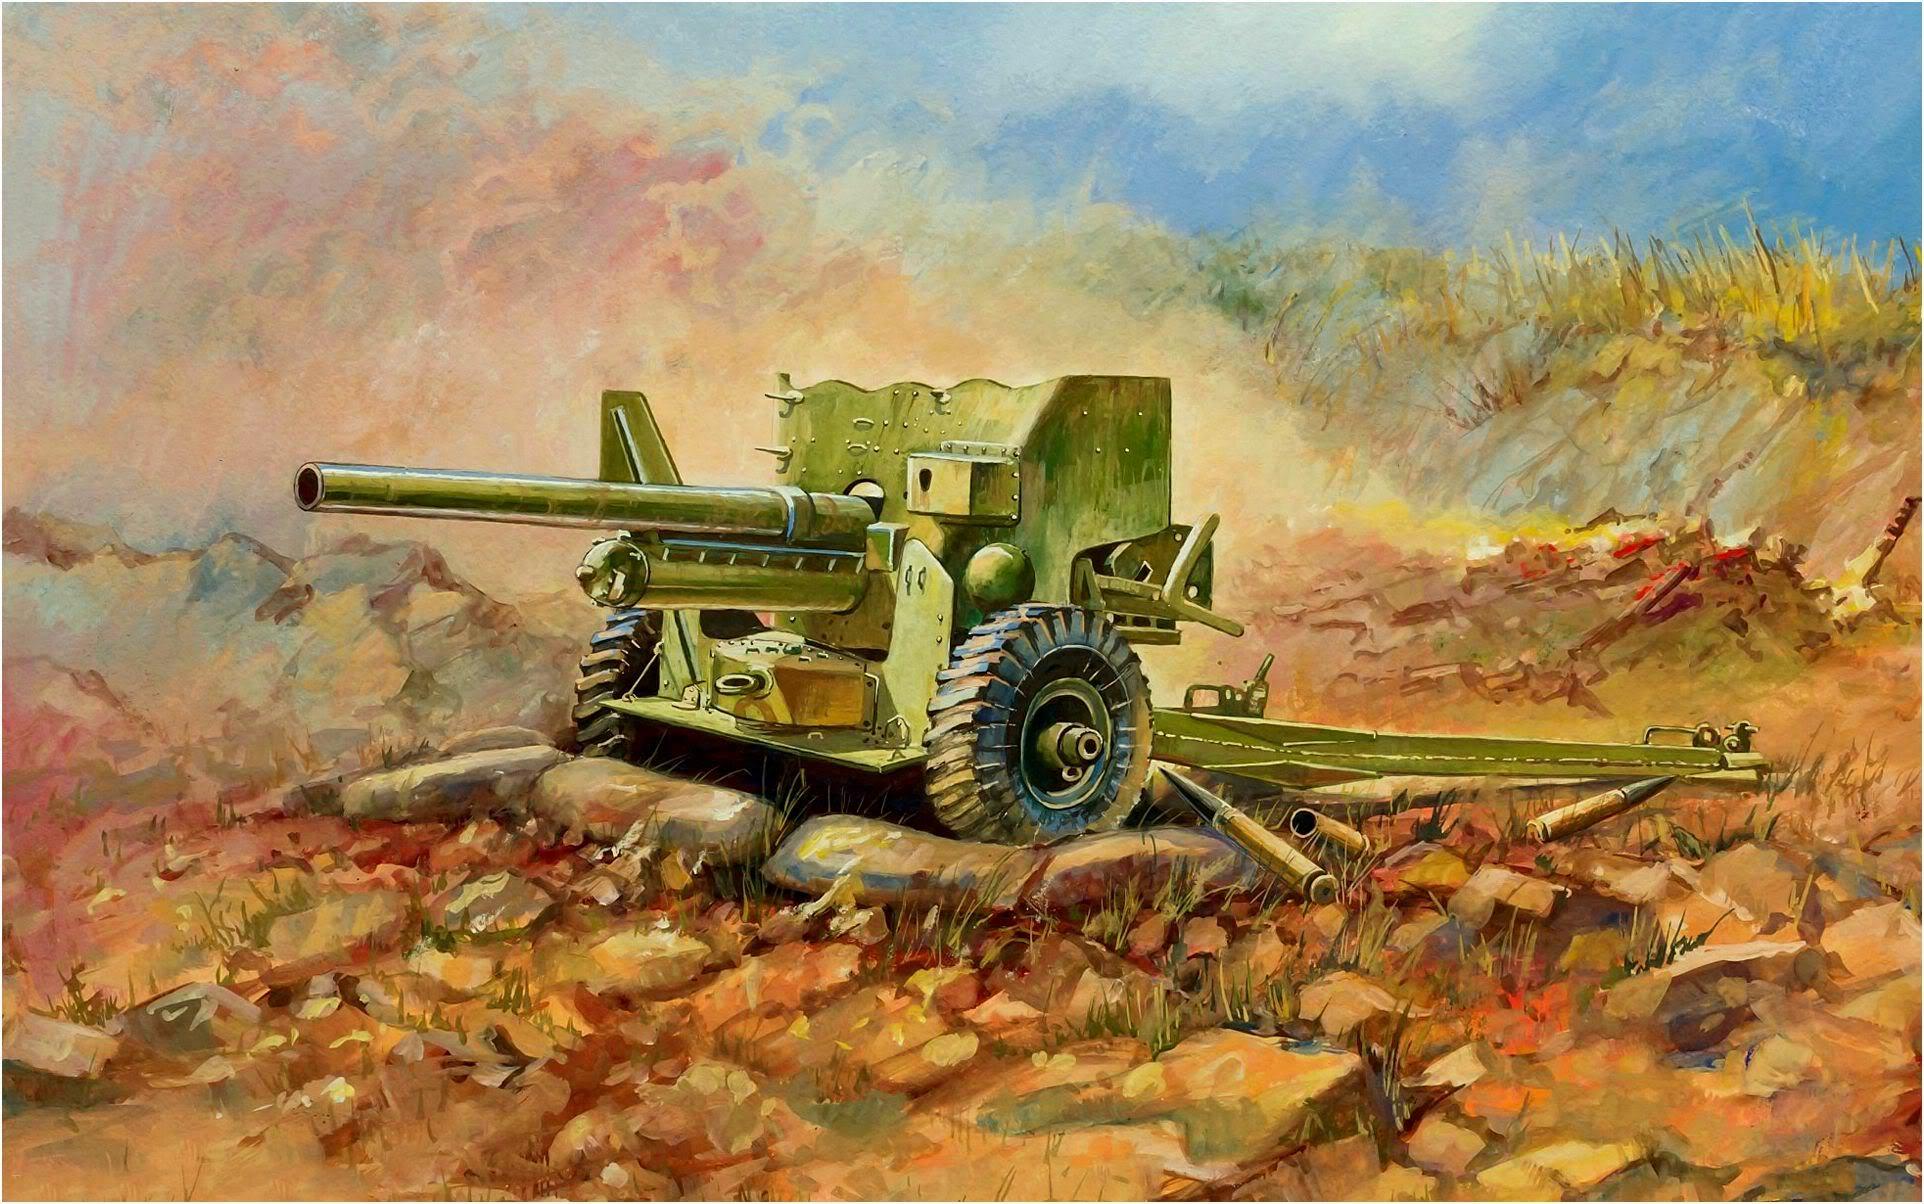 Дудчик Дмитрий. 57-мм противотанковая пушка.